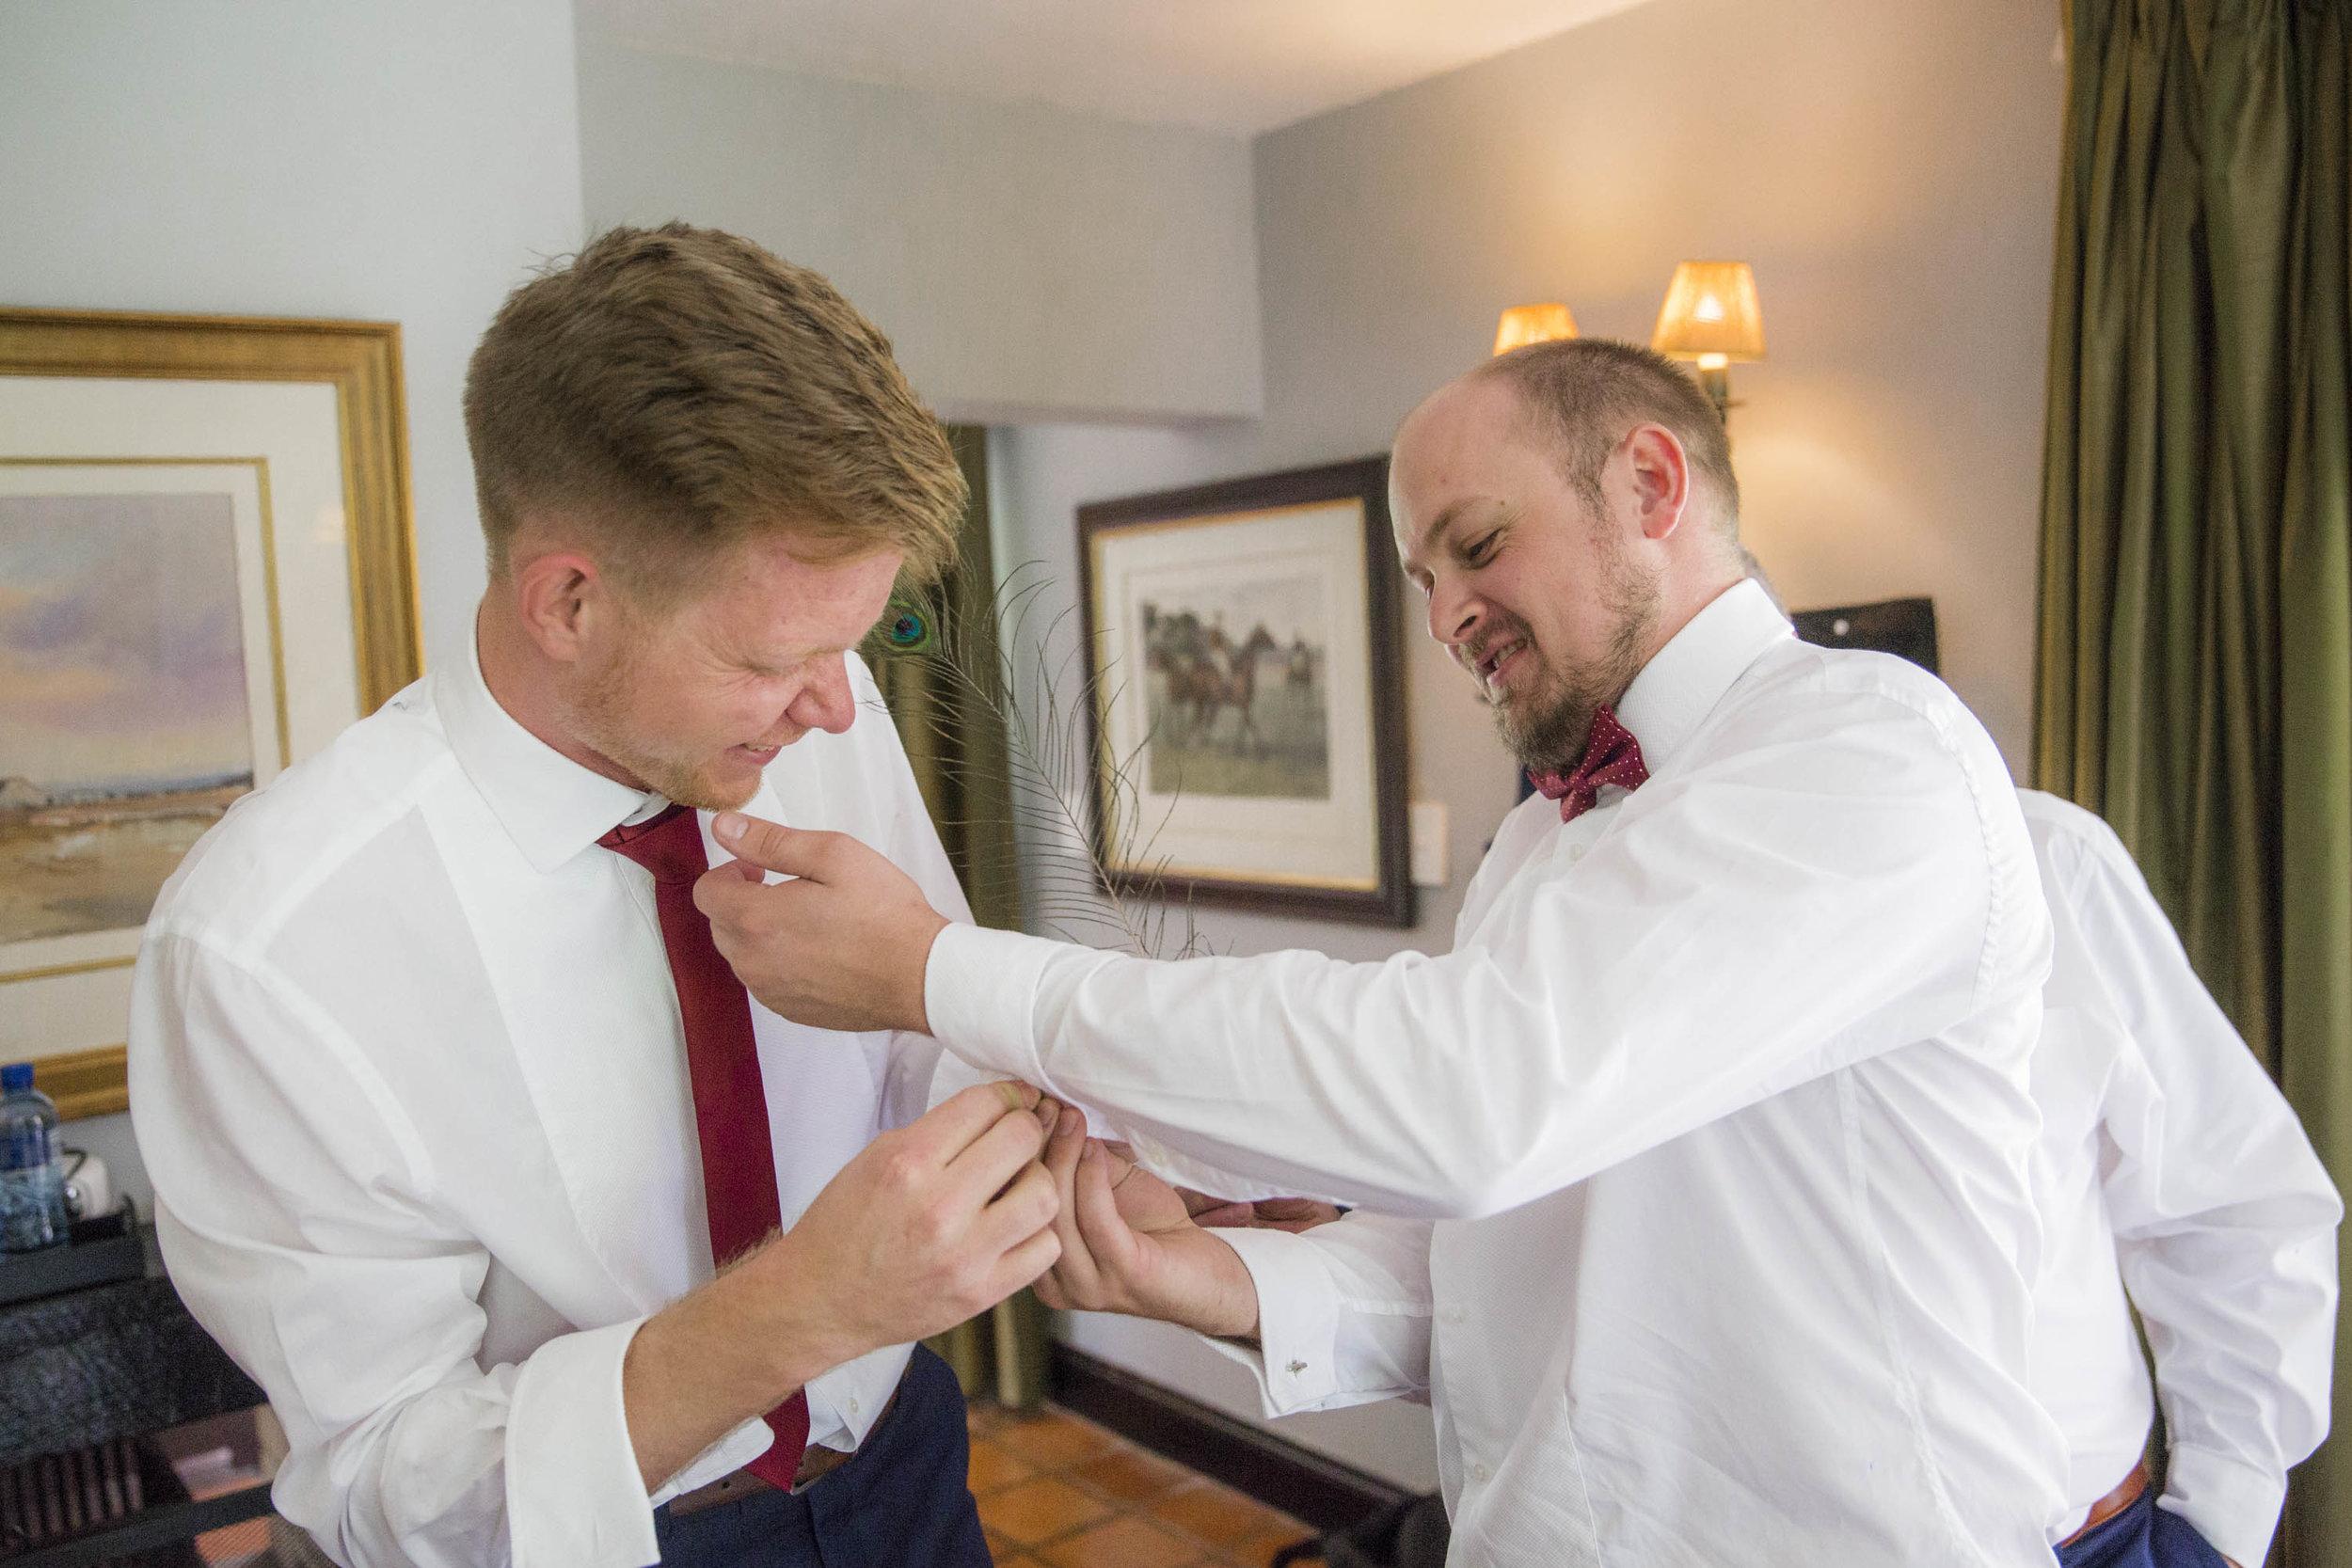 027-documentary-wedding-photographers-johannesburg.JPG